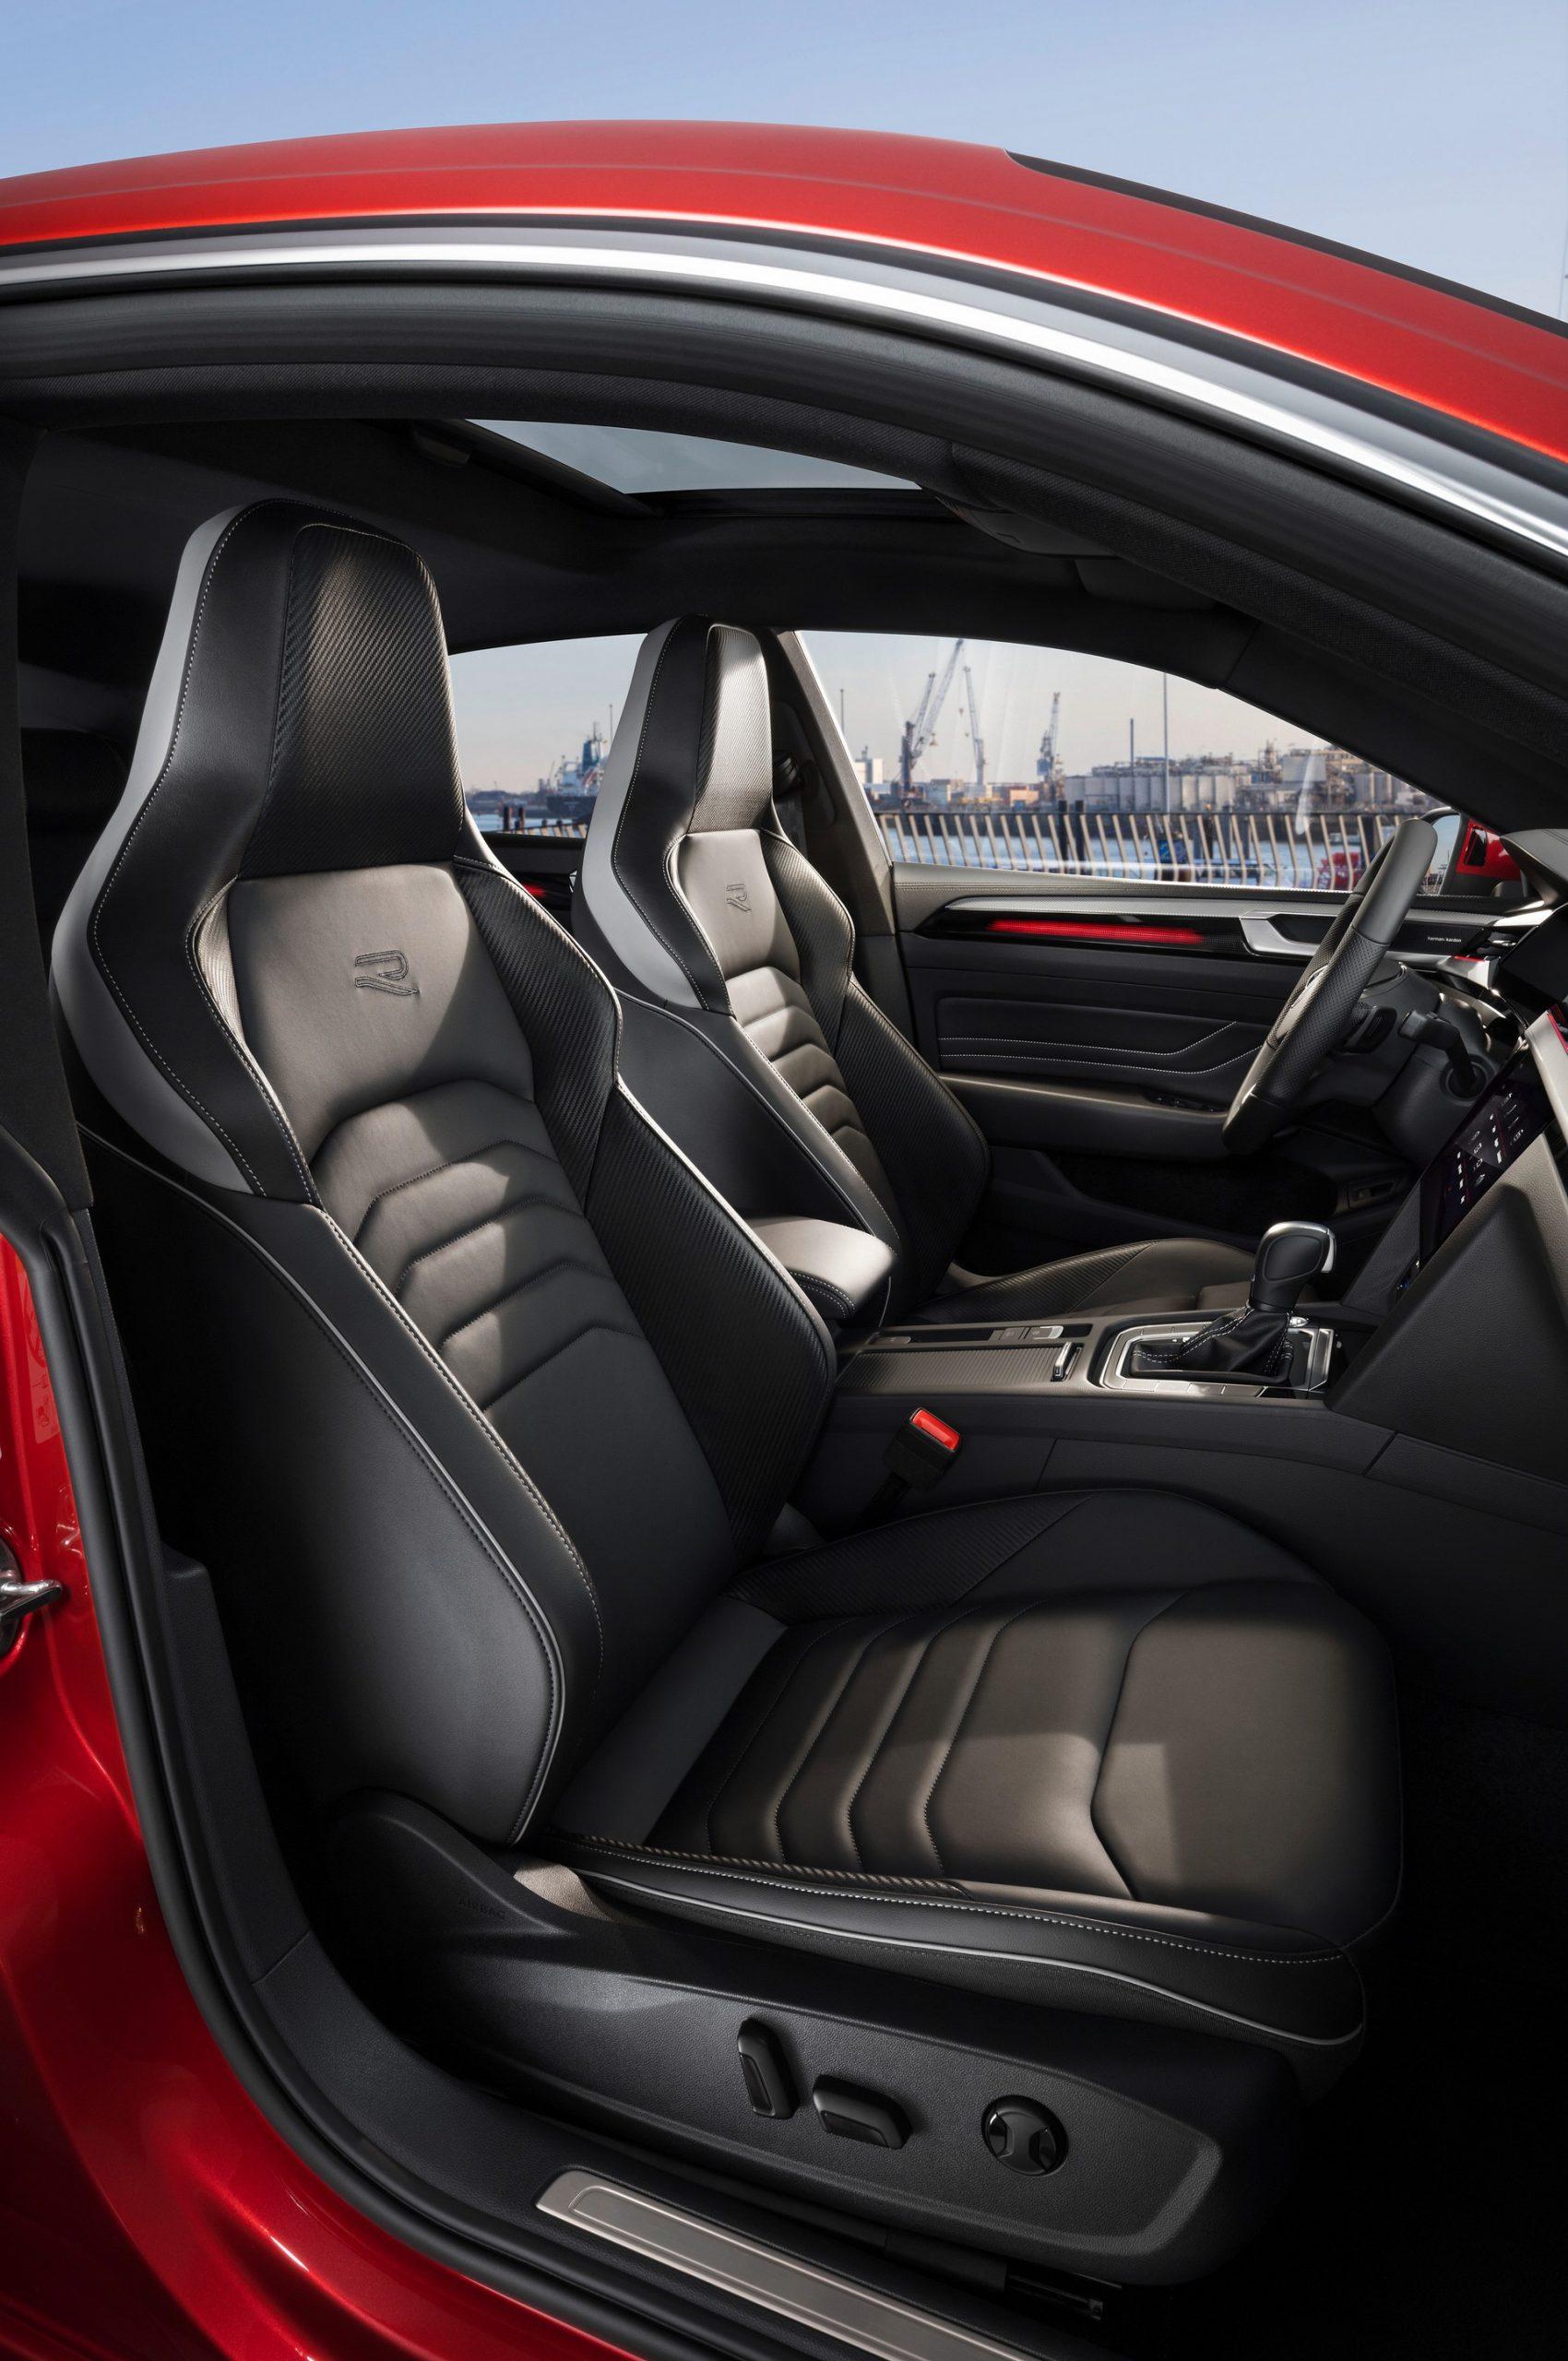 Immagine abitacolo Volkswagen Arteon Restyling 2020